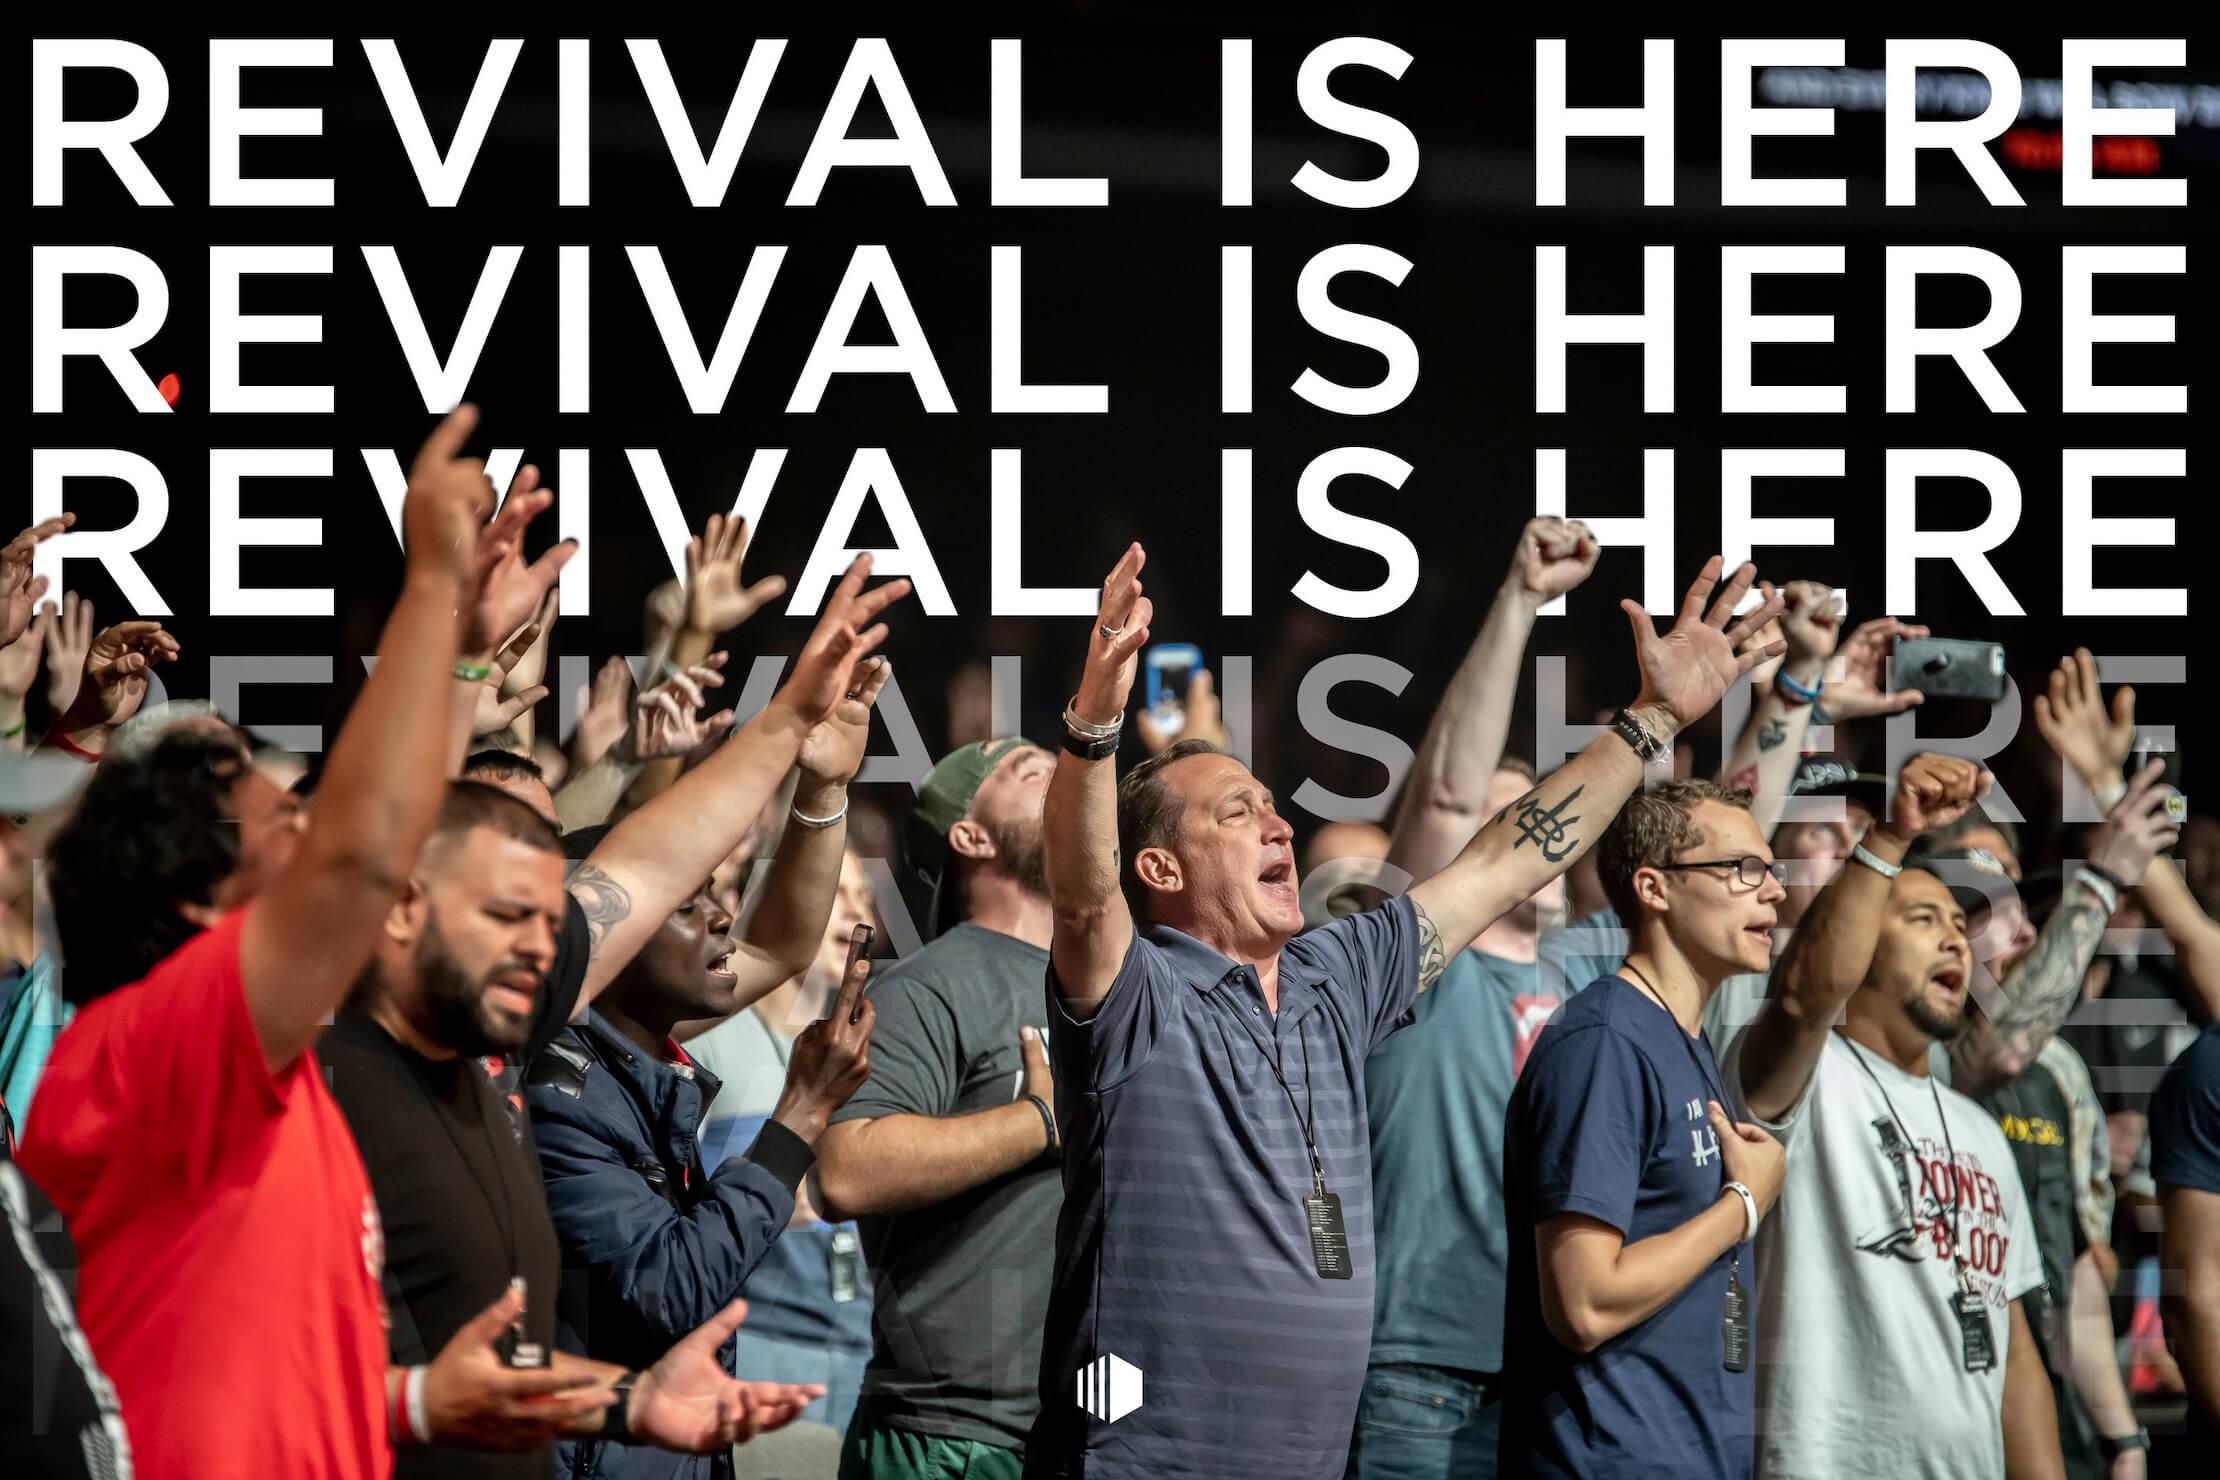 Men's Summit 2021: Revival